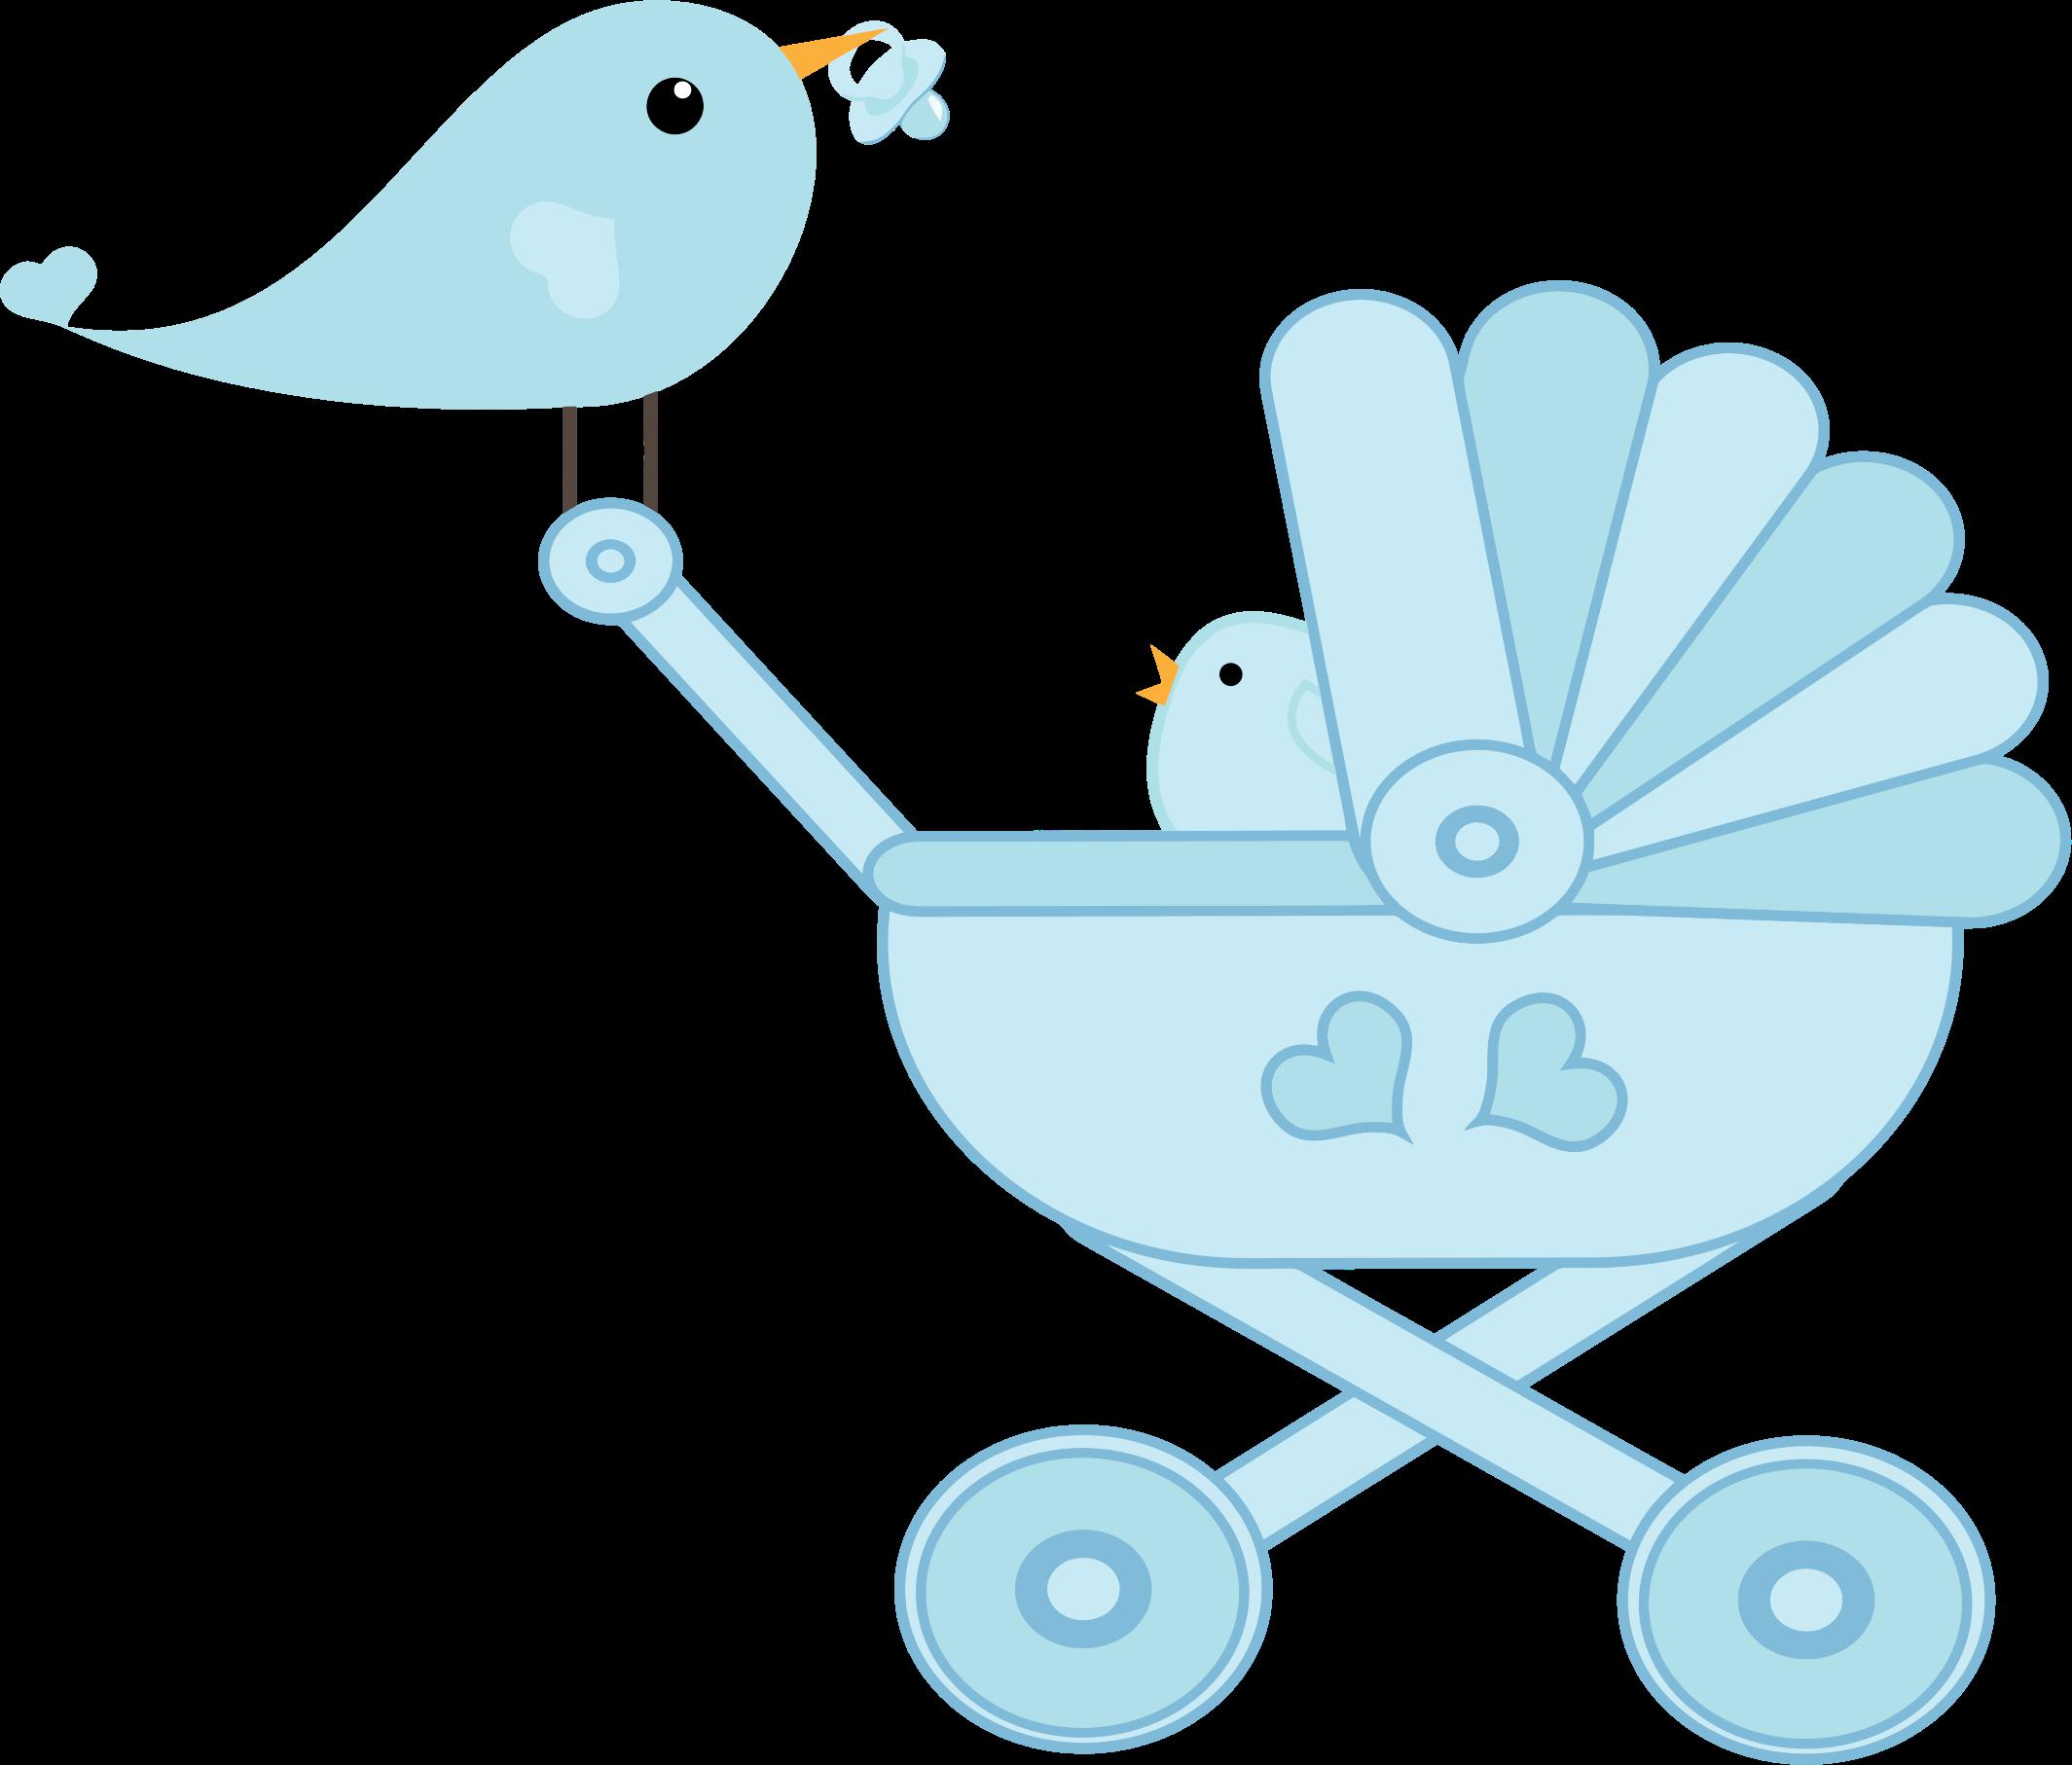 Brds baby boy pencil. Clipart home bird